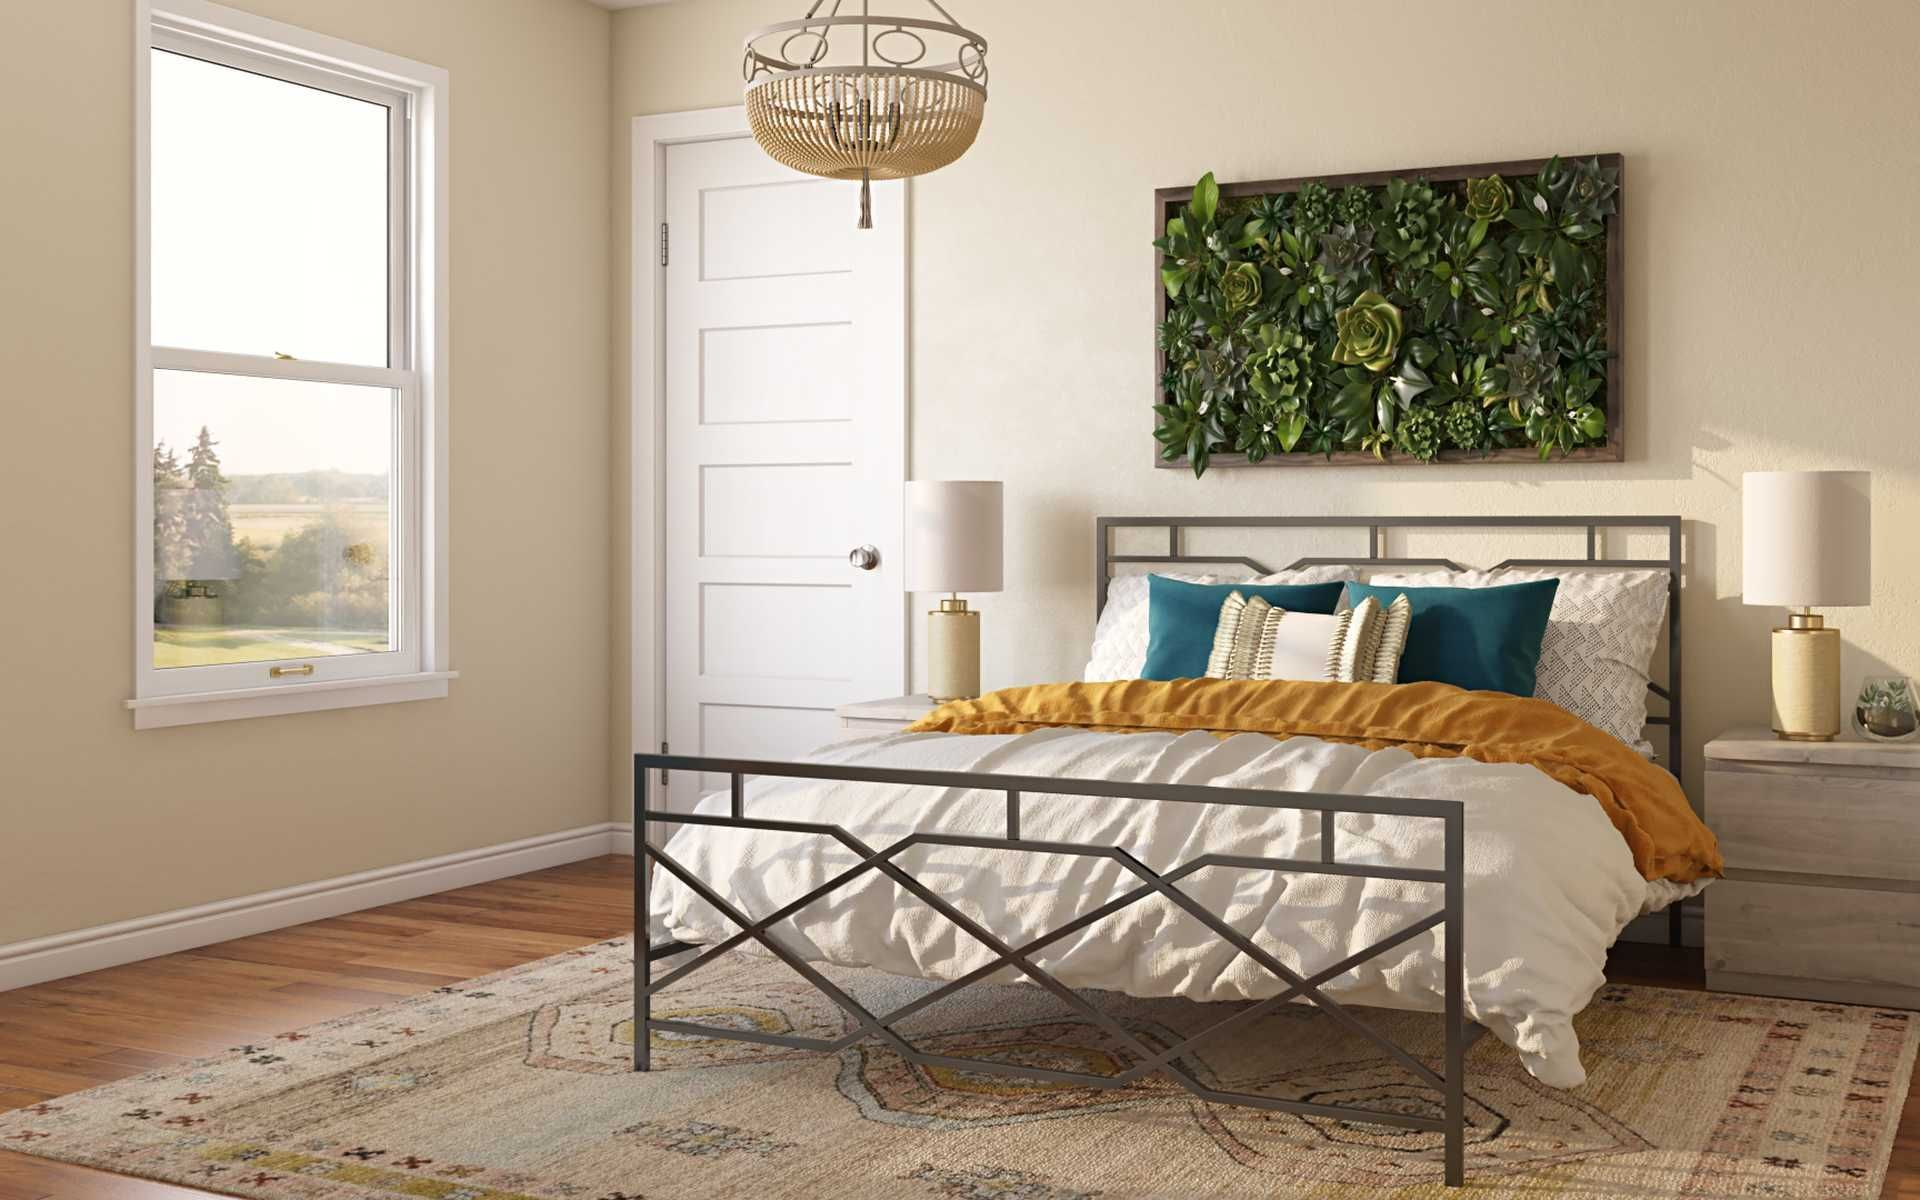 Bohemian Southwest Inspired Bedroom Design By Havenly Interior Designer Leslie In 2021 Interior Design Room Inspiration Online Interior Design